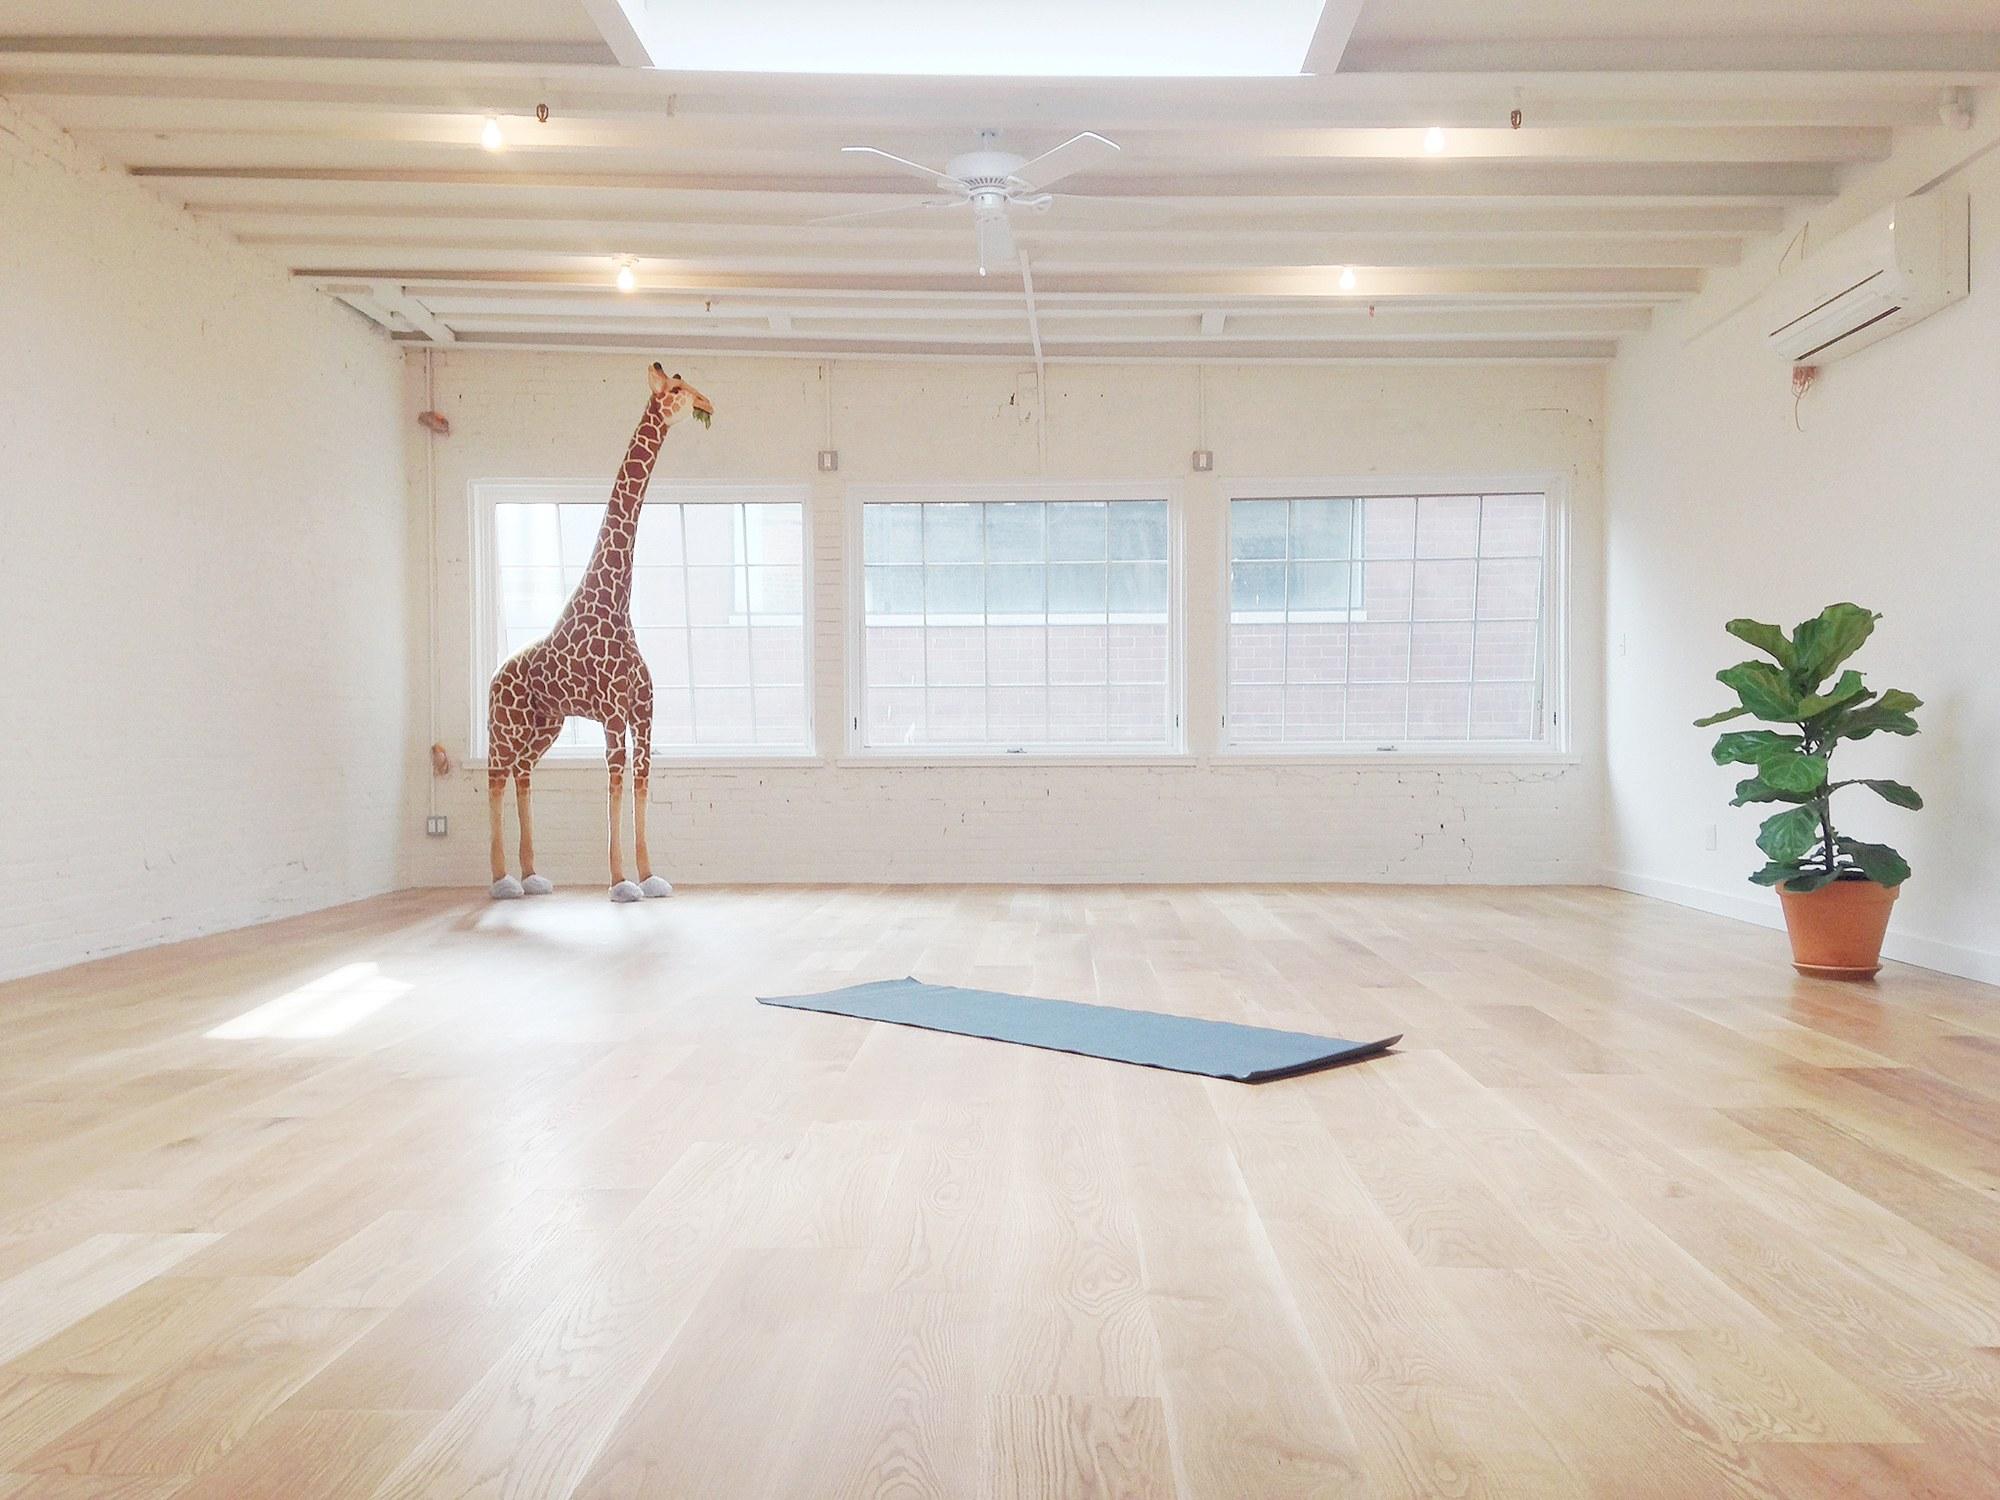 02-krissy-jones-skyting-yoga.jpg